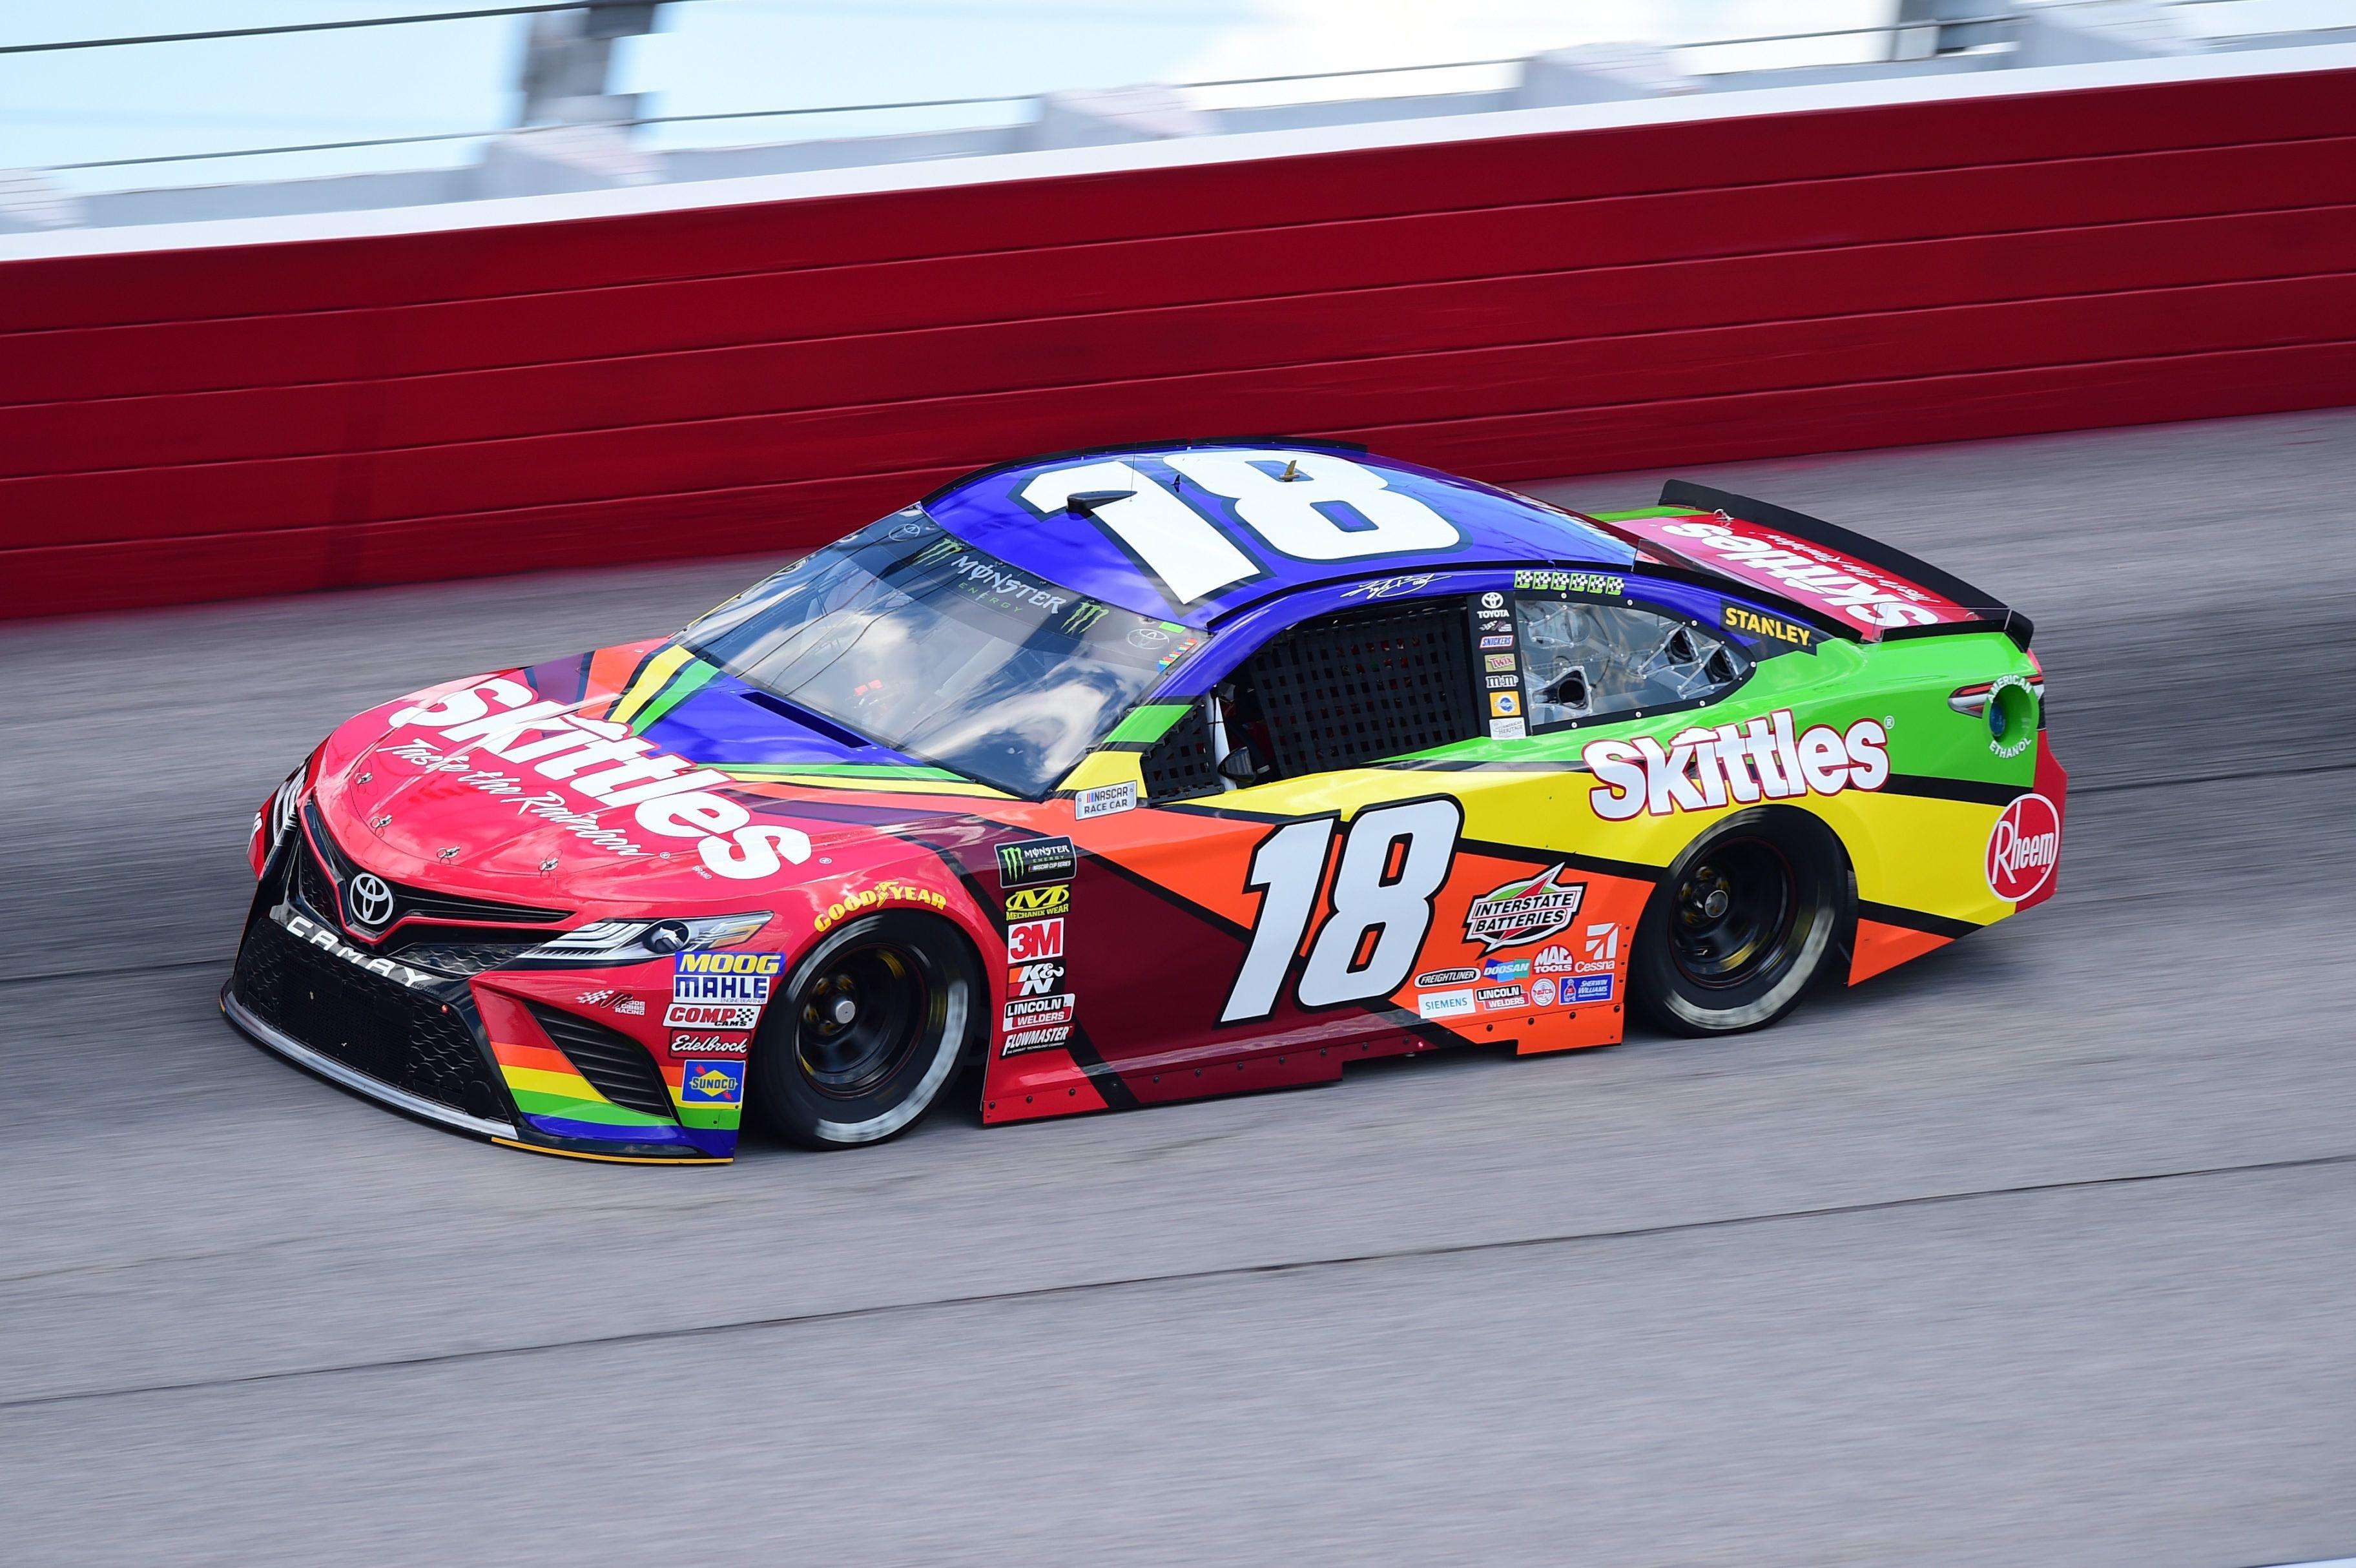 Kyle Busch Talks Rumors For Nascar 2021 Independent Rear Suspensions Racing News Nascar Nascar Race Cars Nascar Tires